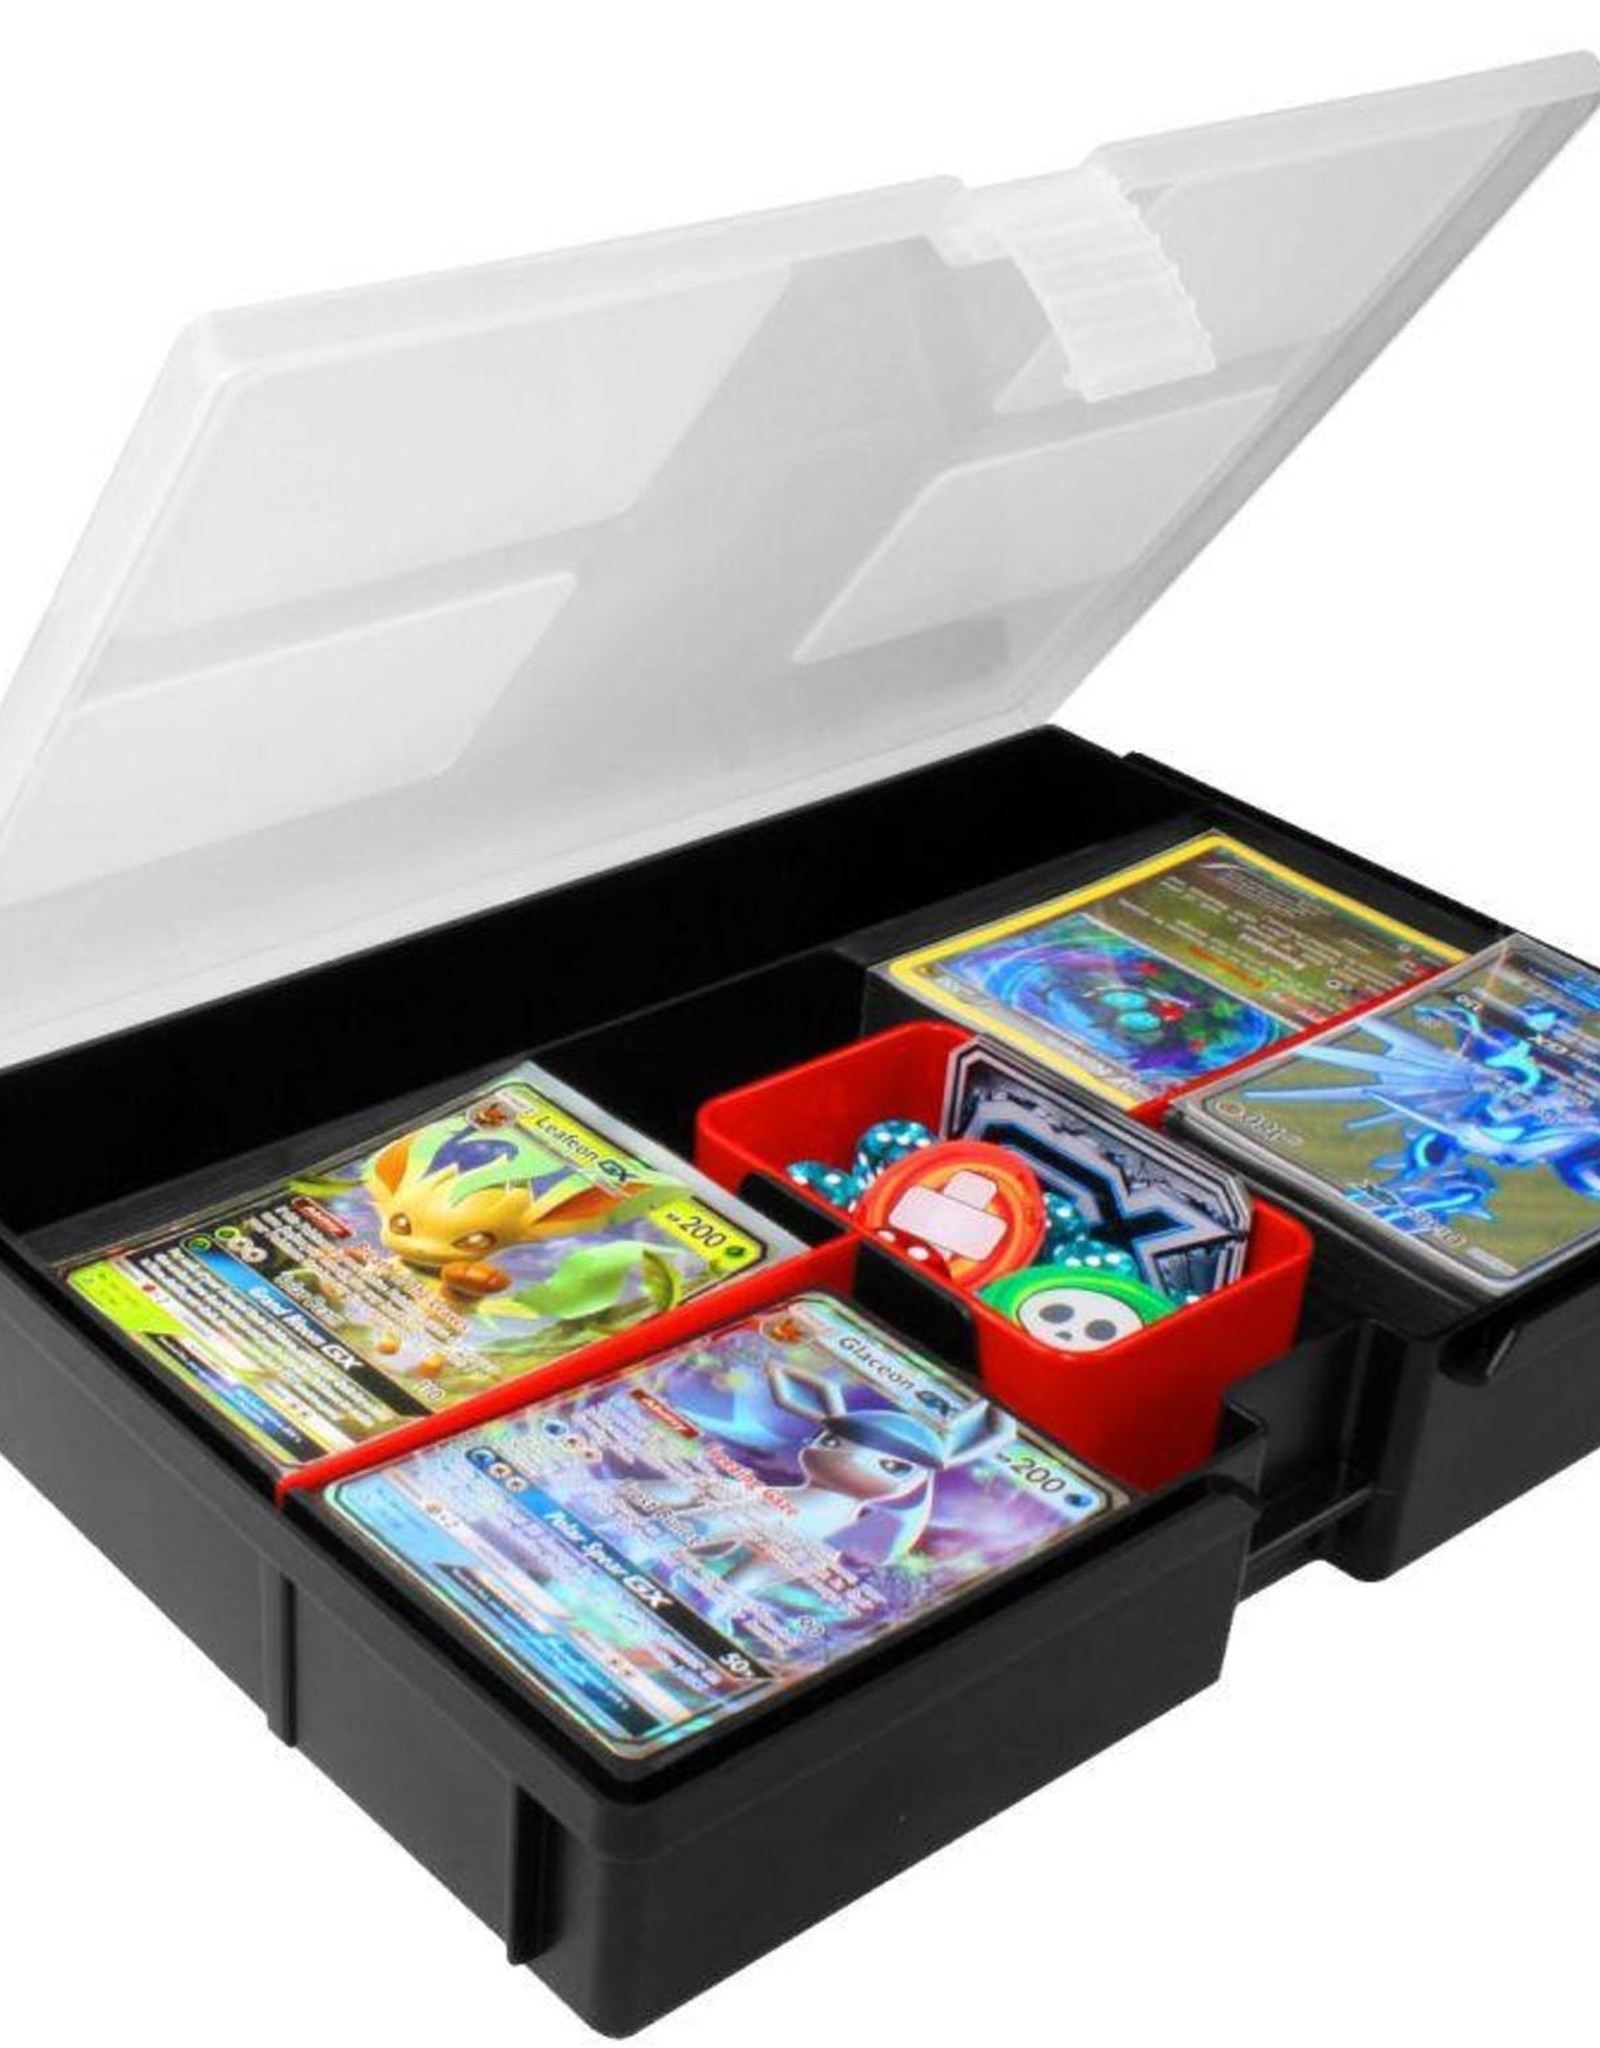 BCW Prime X4 Gaming Box